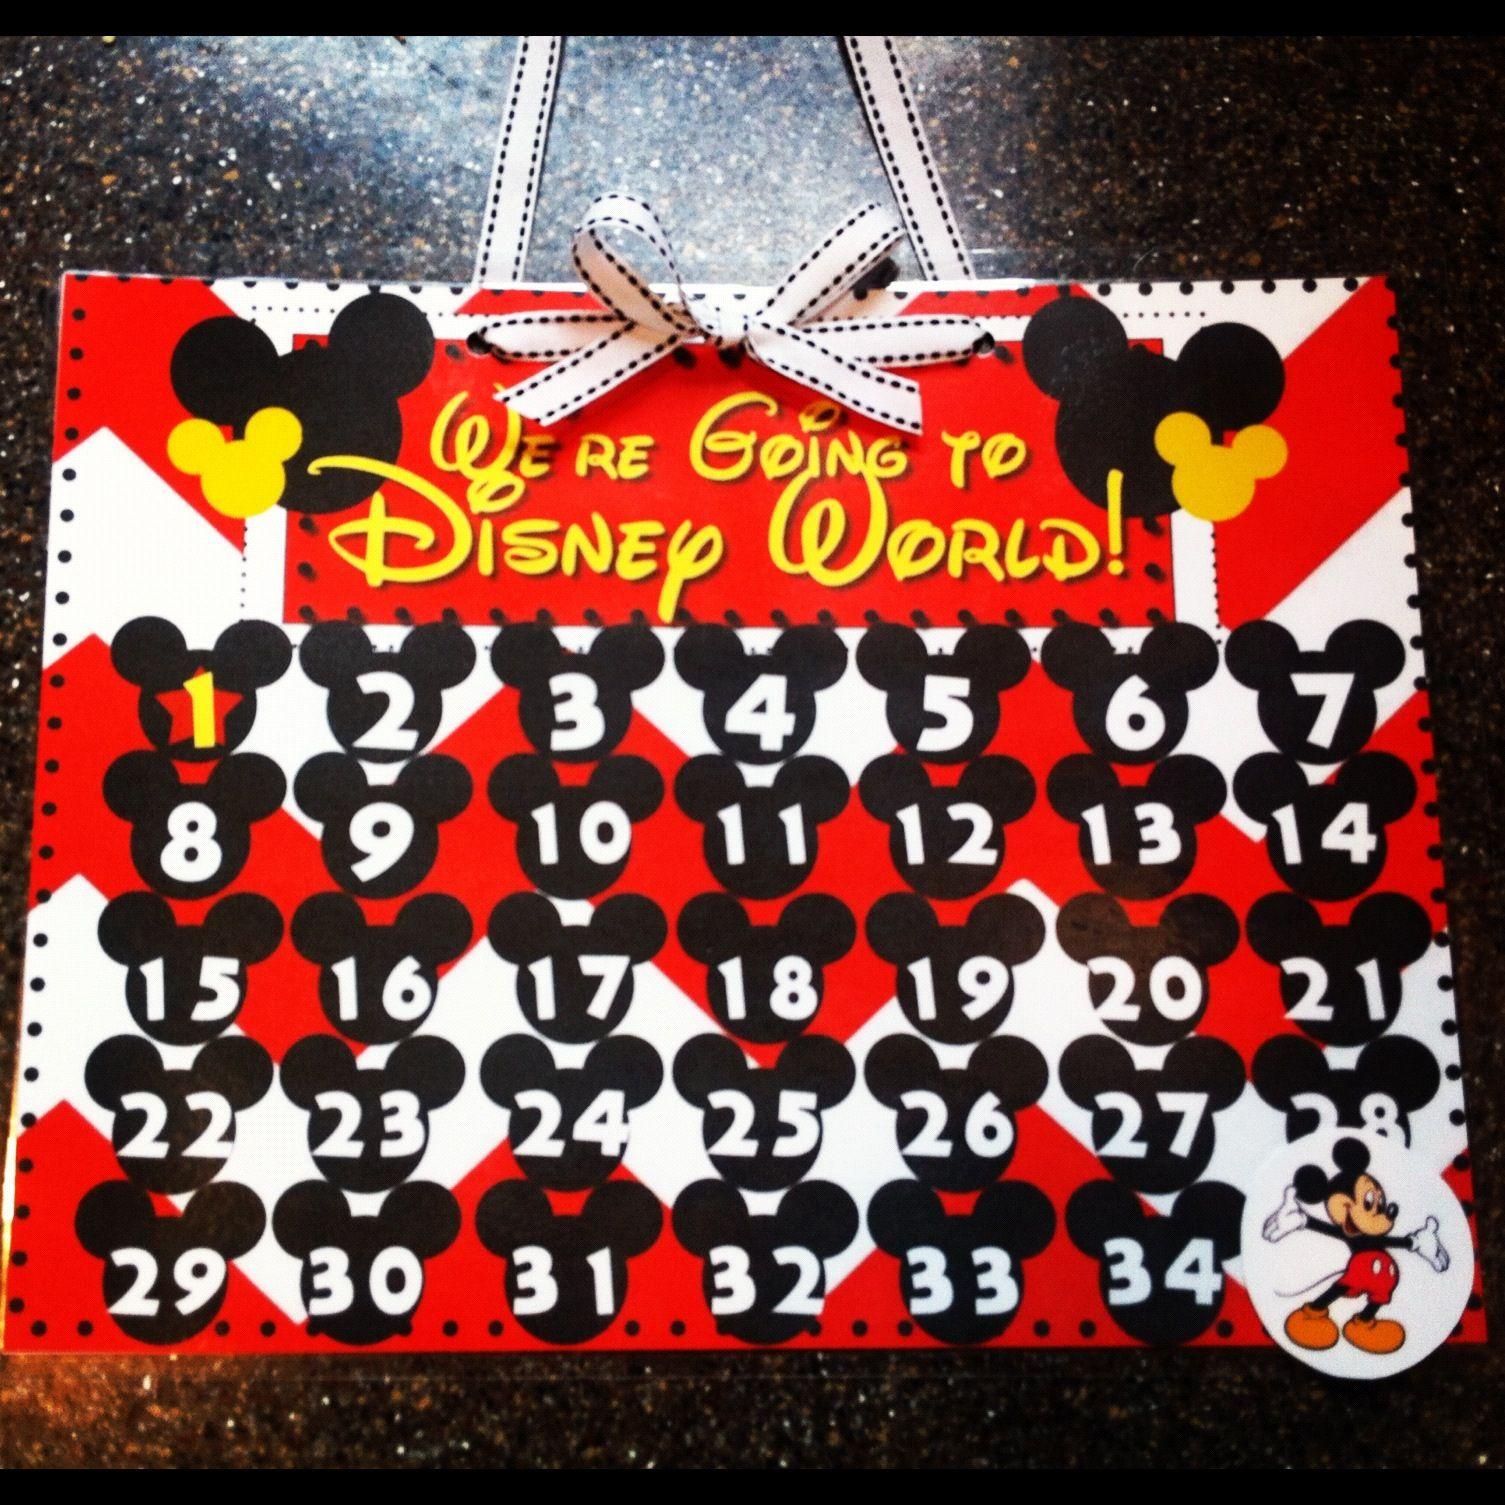 image about Disney Countdown Printable known as Disney Countdown Calendar- Cost-free Printable Disney Disney